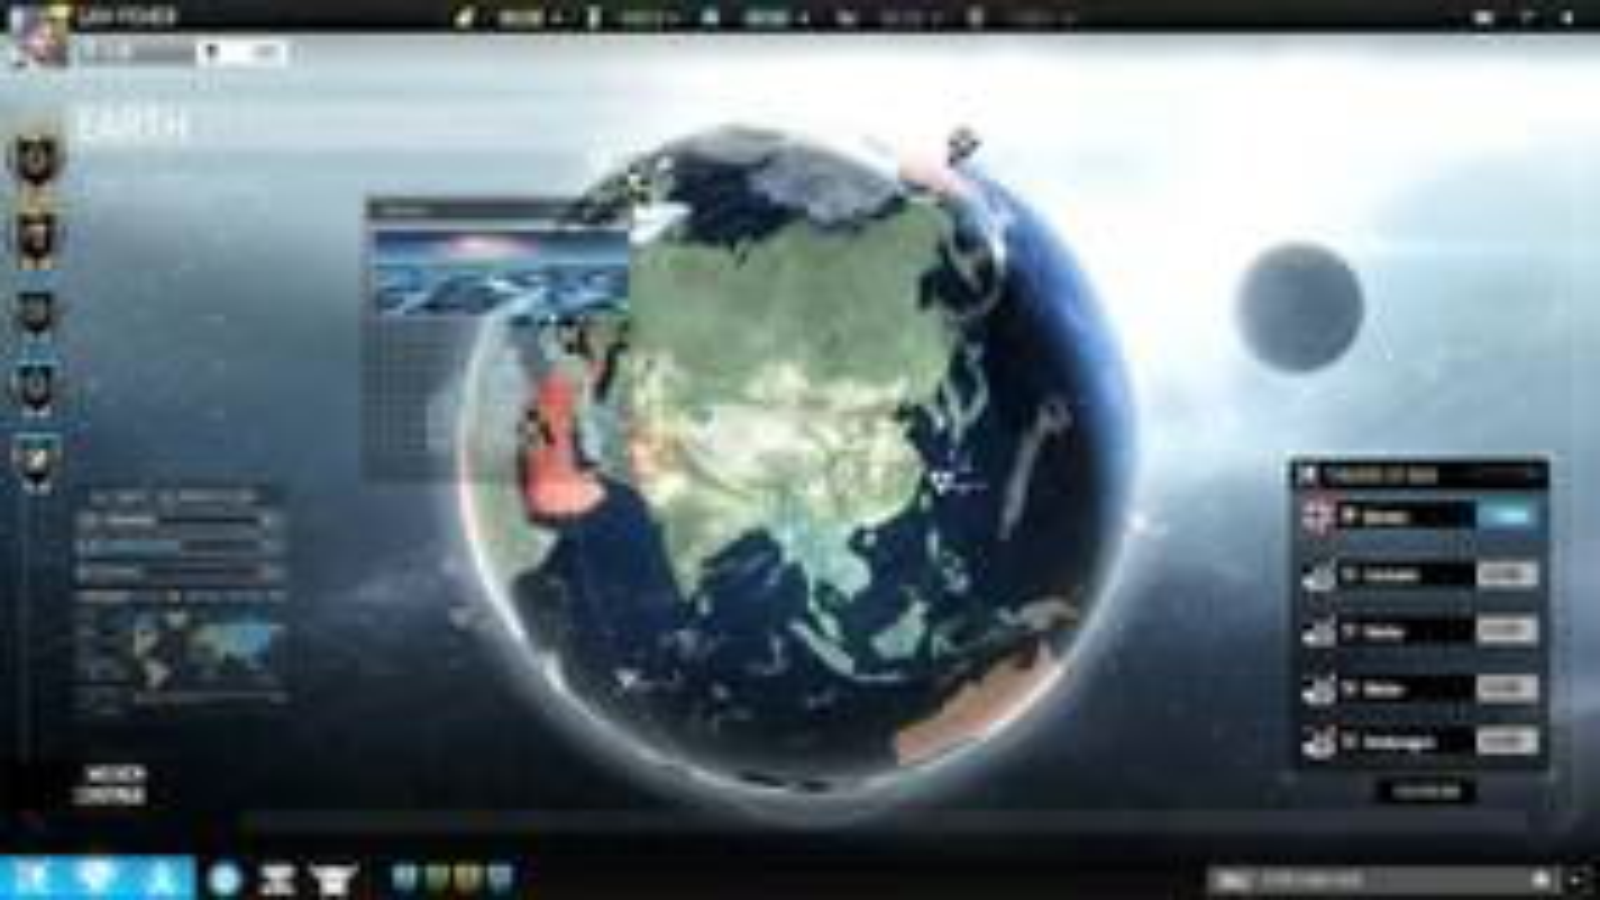 Image for Tom Clancy's EndWar Online gets a teaser trailer, first technical test dated